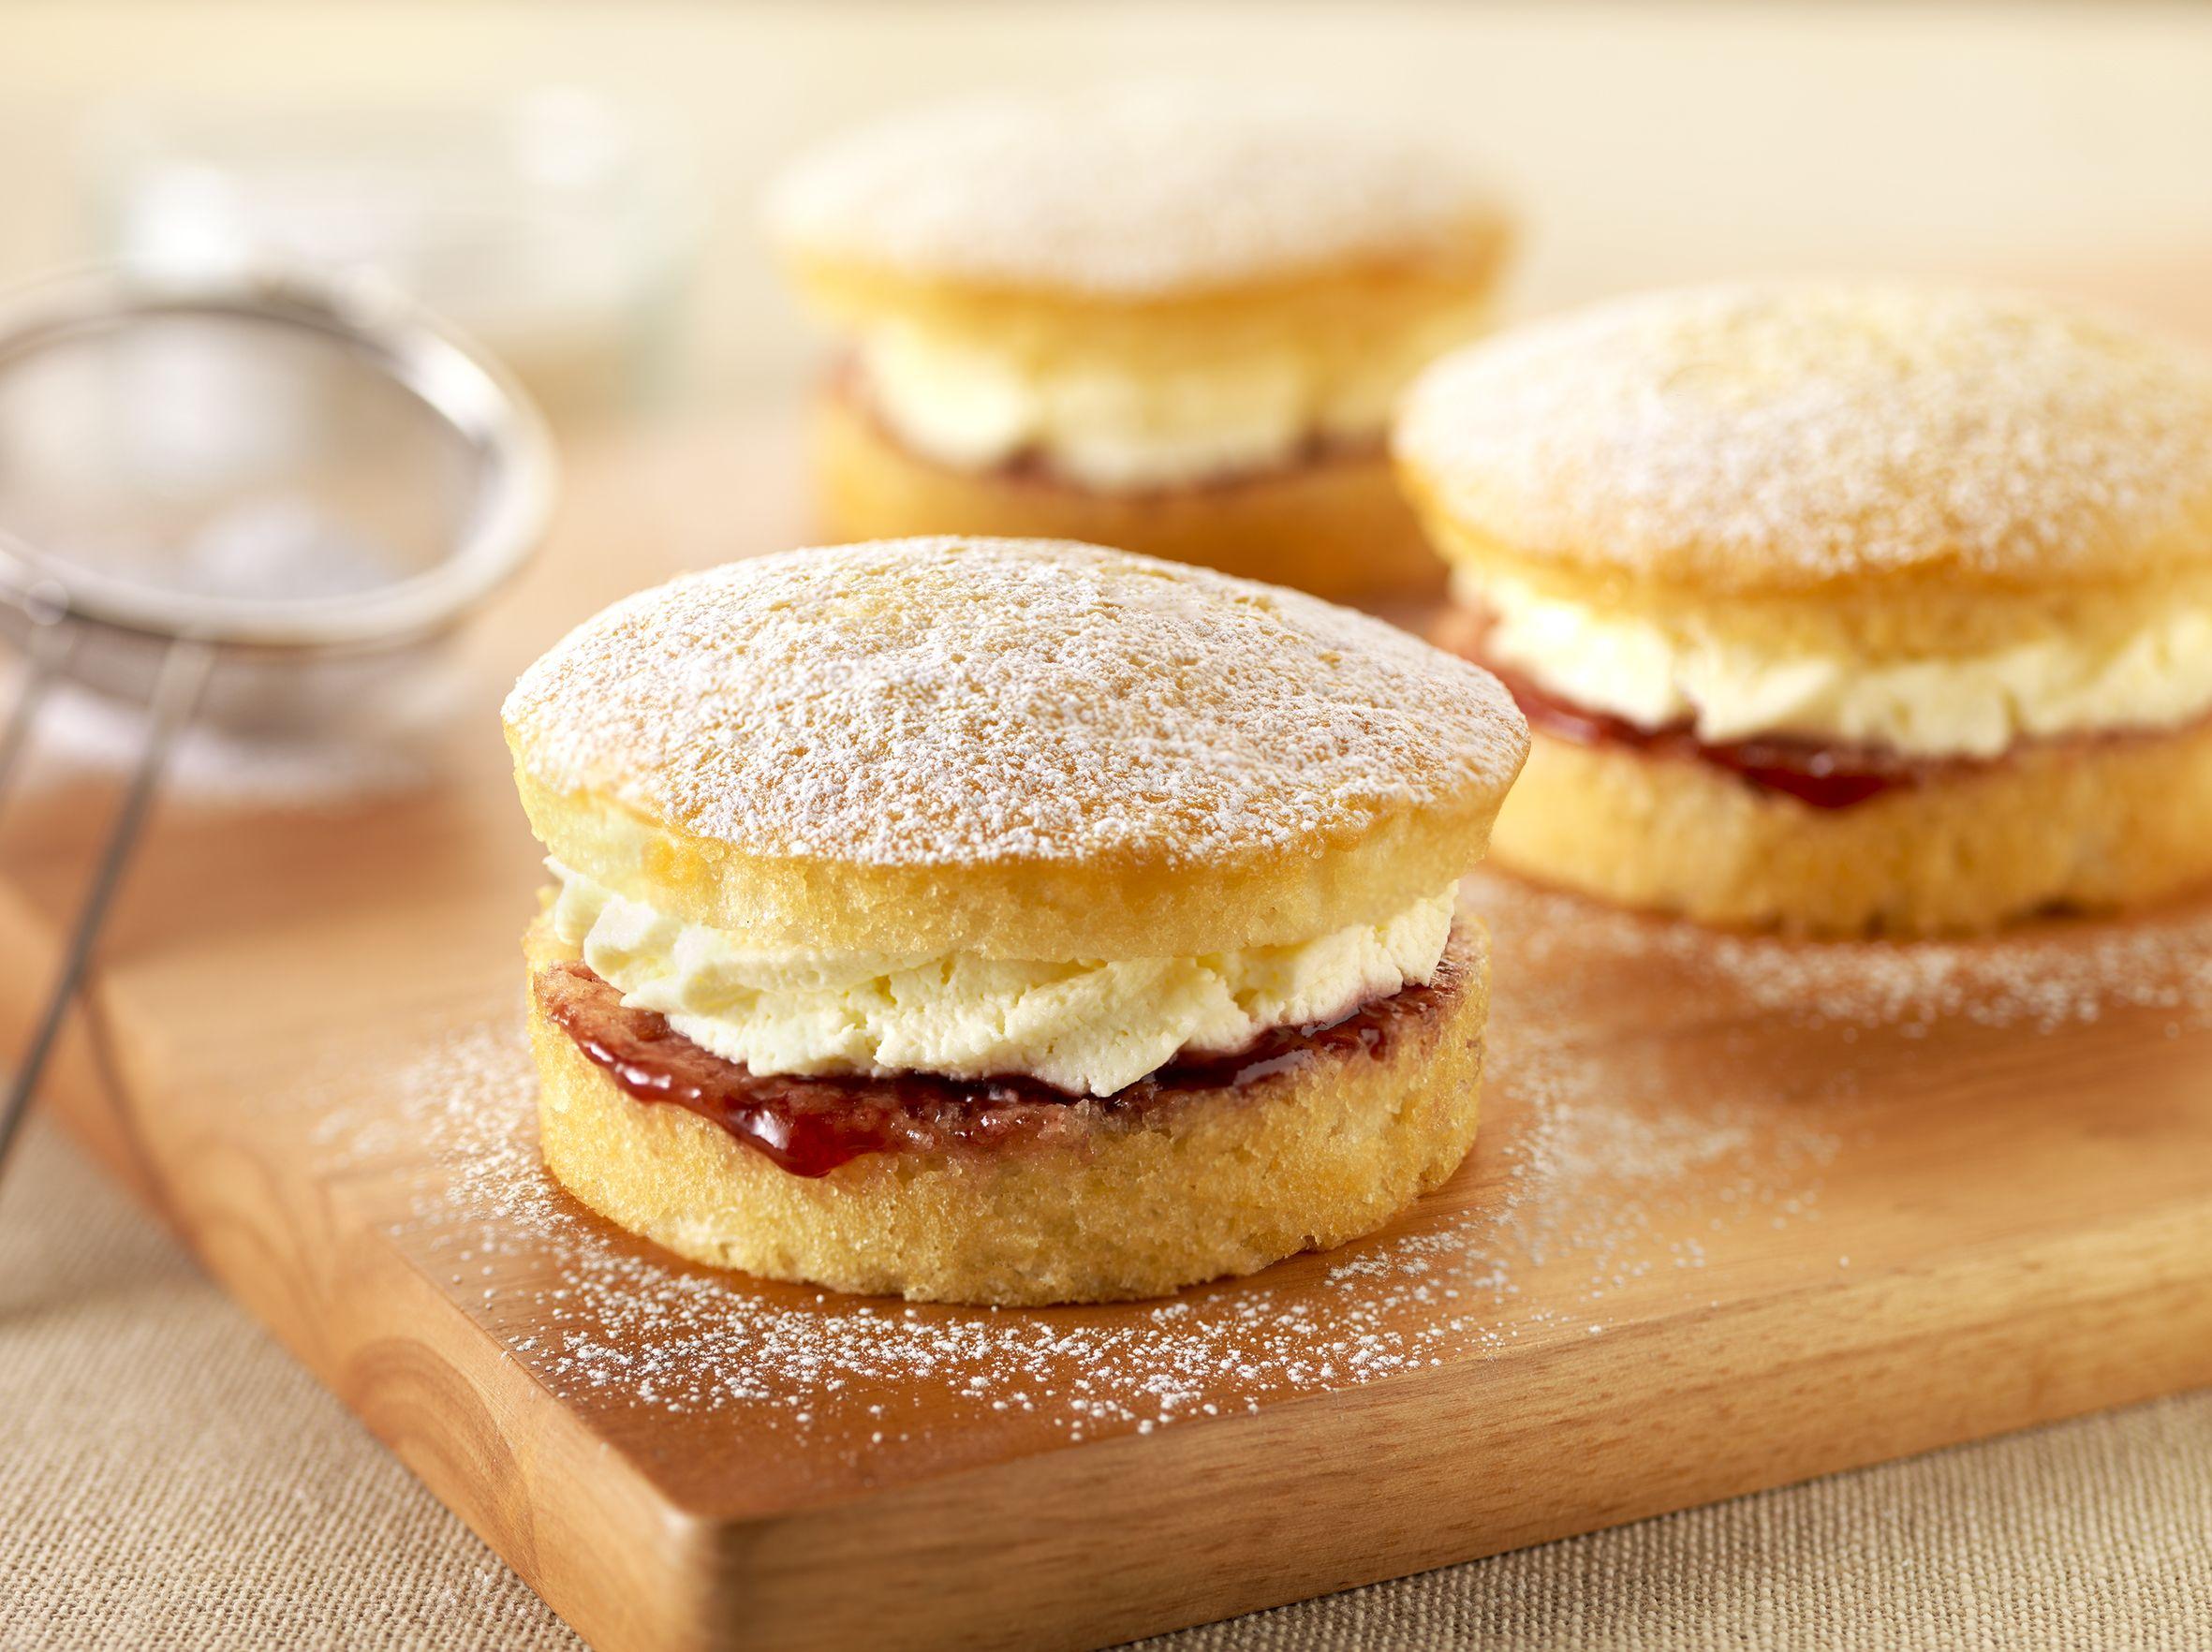 Diabetic Sponge Cake Recipes Uk: Mini Cream Victoria Sponge - Greggs